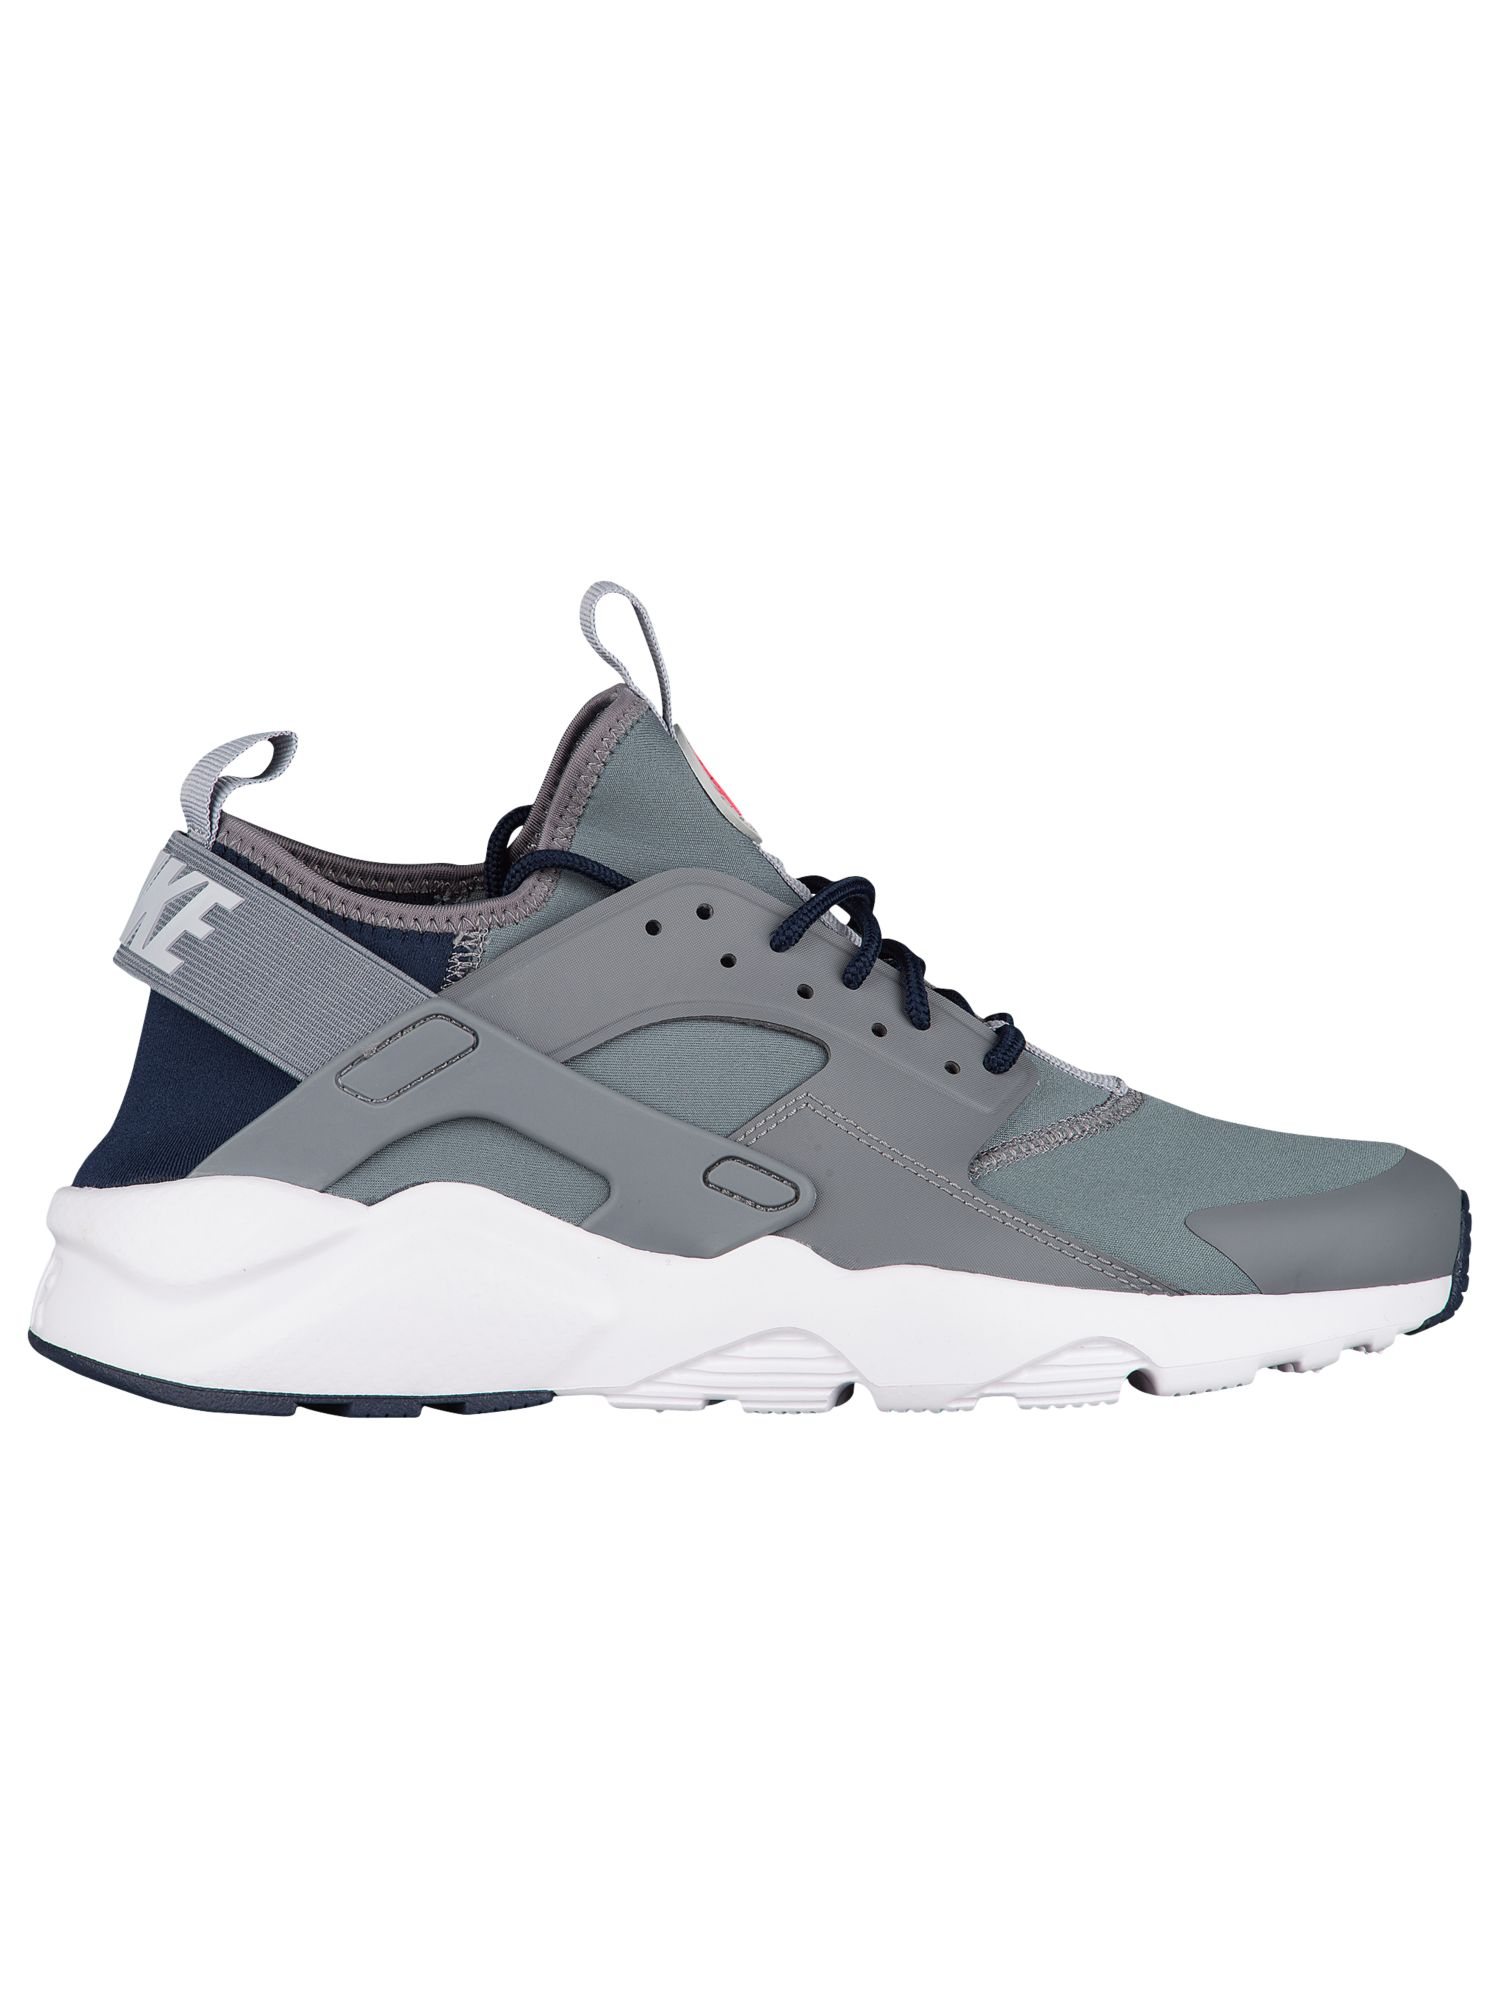 huge discount 2b1cd 29b9c Nike Air Huarache Run Ultra Men's Running Shoes Cool Grey/Wolf Grey/Obsidian/Solar  Red - Walmart.com